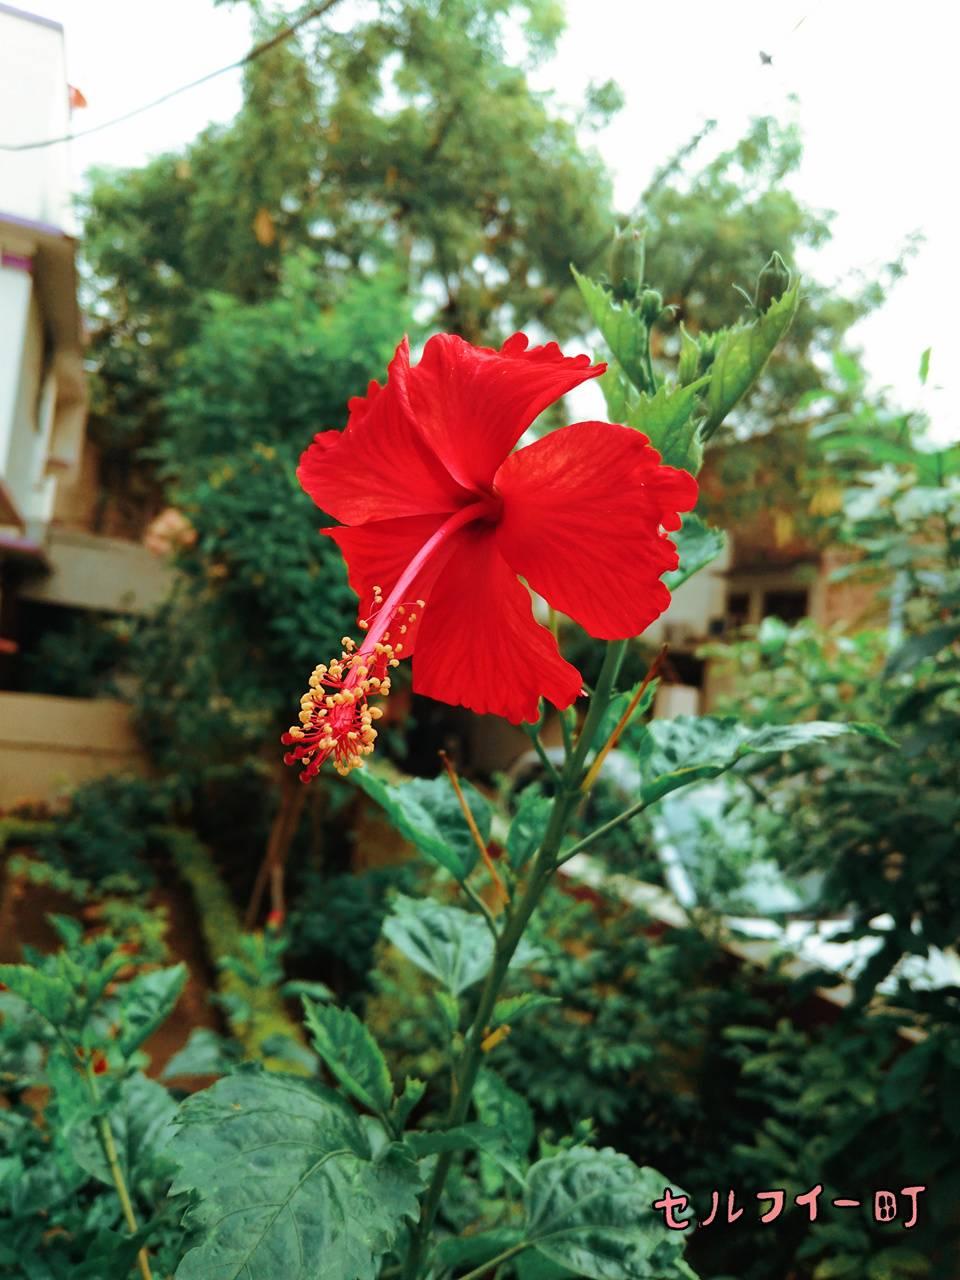 Red Bloom Flower